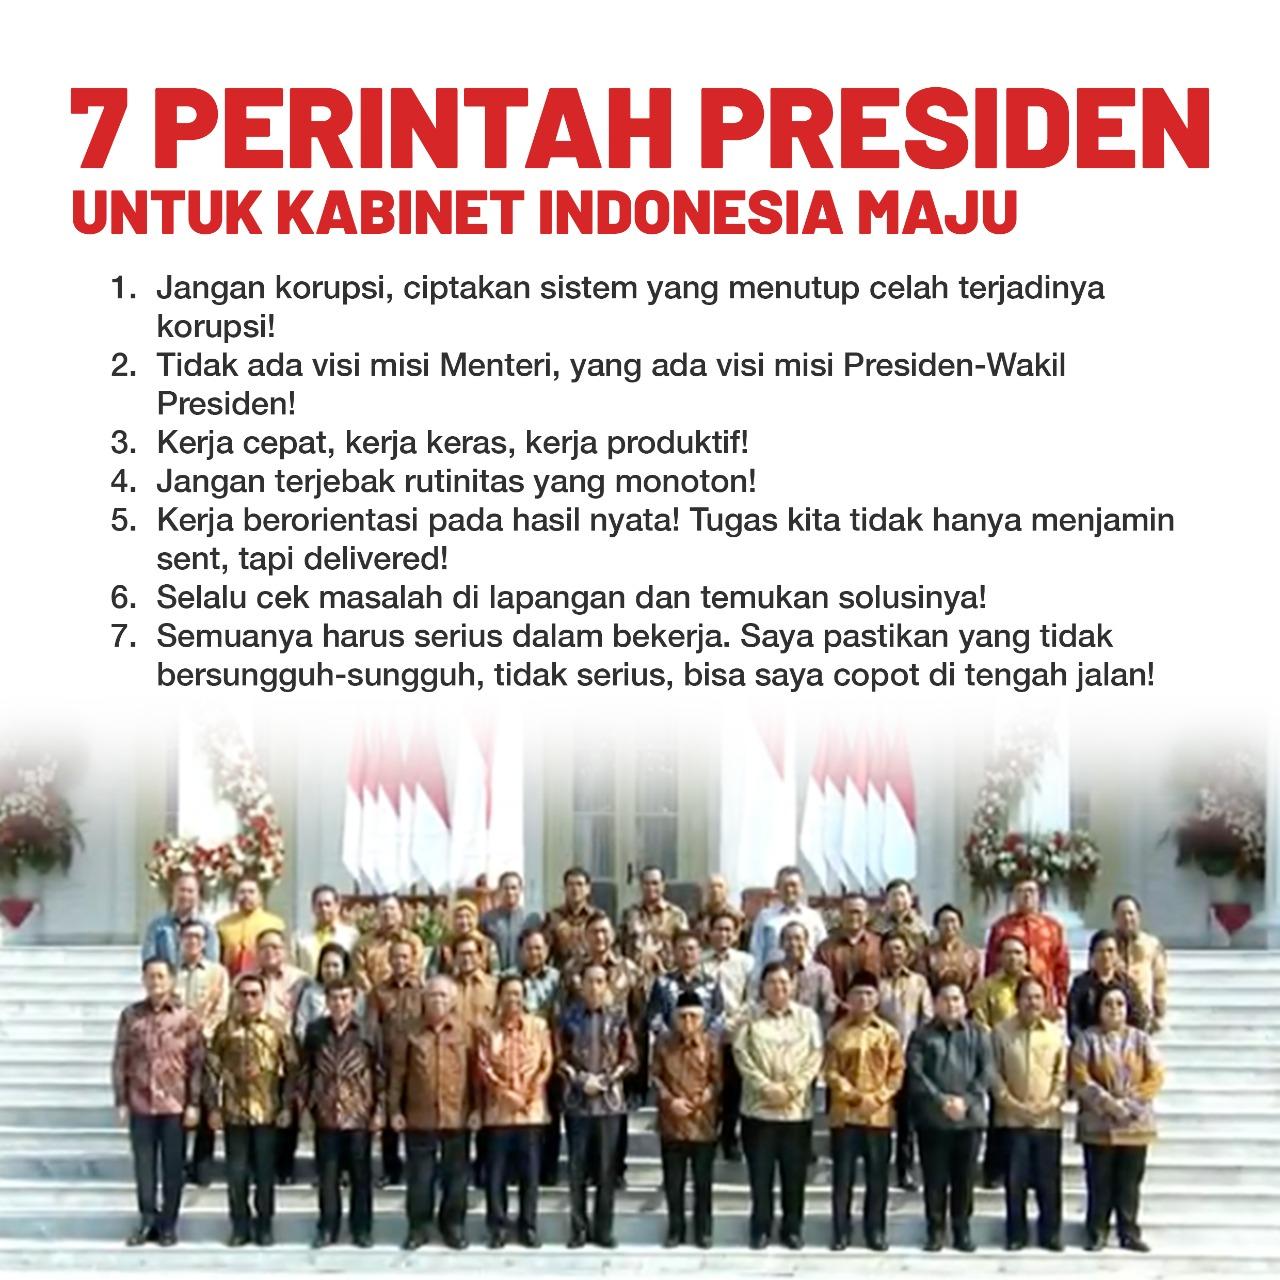 Kecewa Komposisi Kabinet, RMI PBNU: Saya Yakin Presiden Bisa Kualat